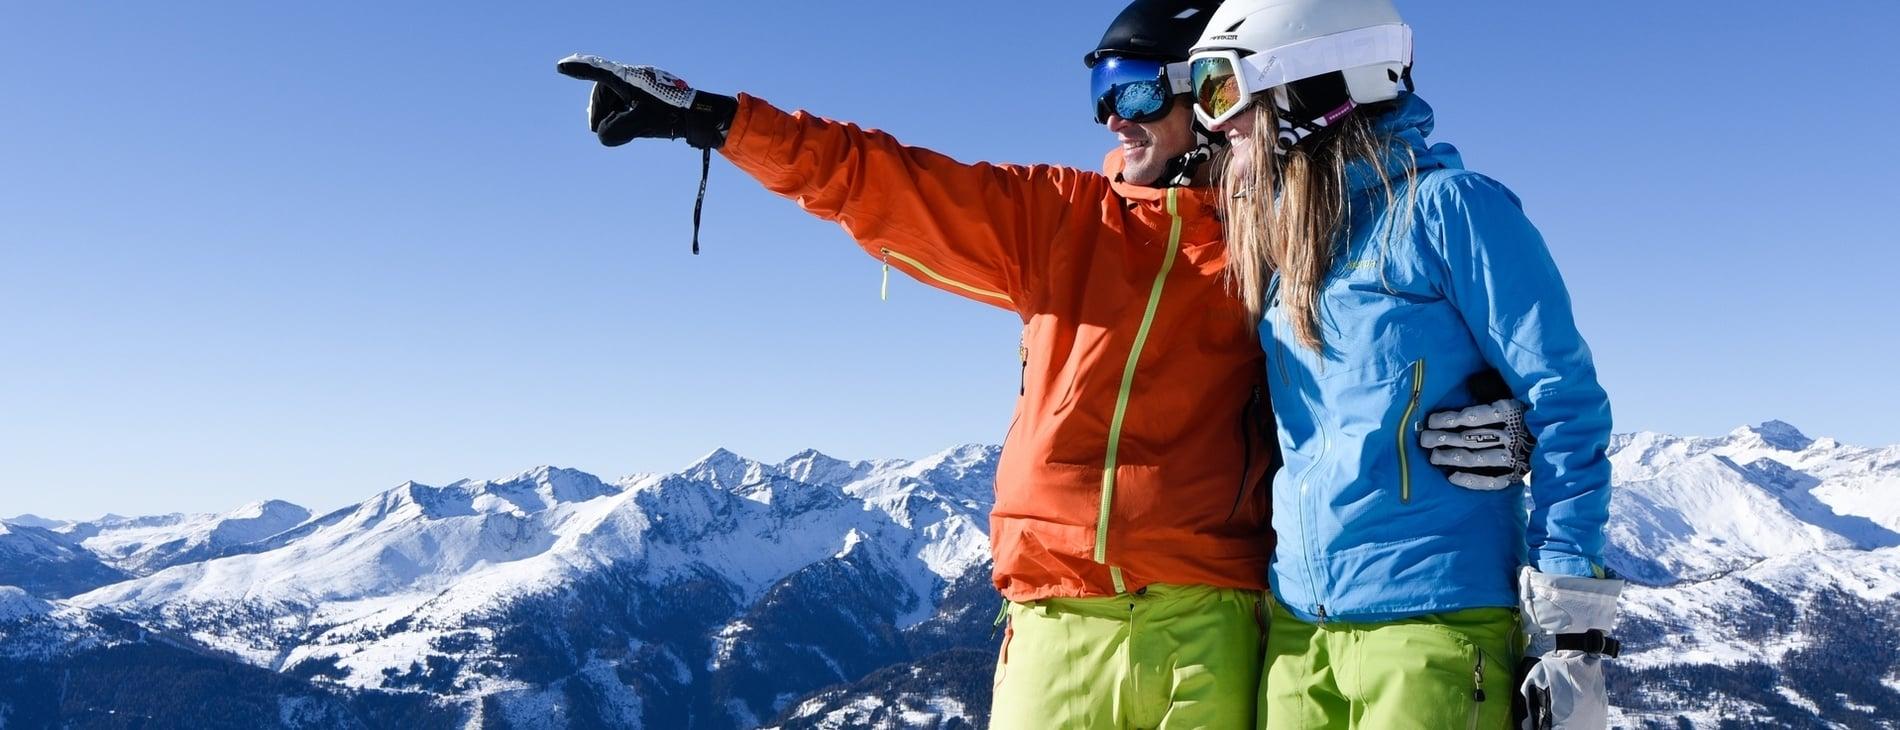 Winter and Ski Holiday